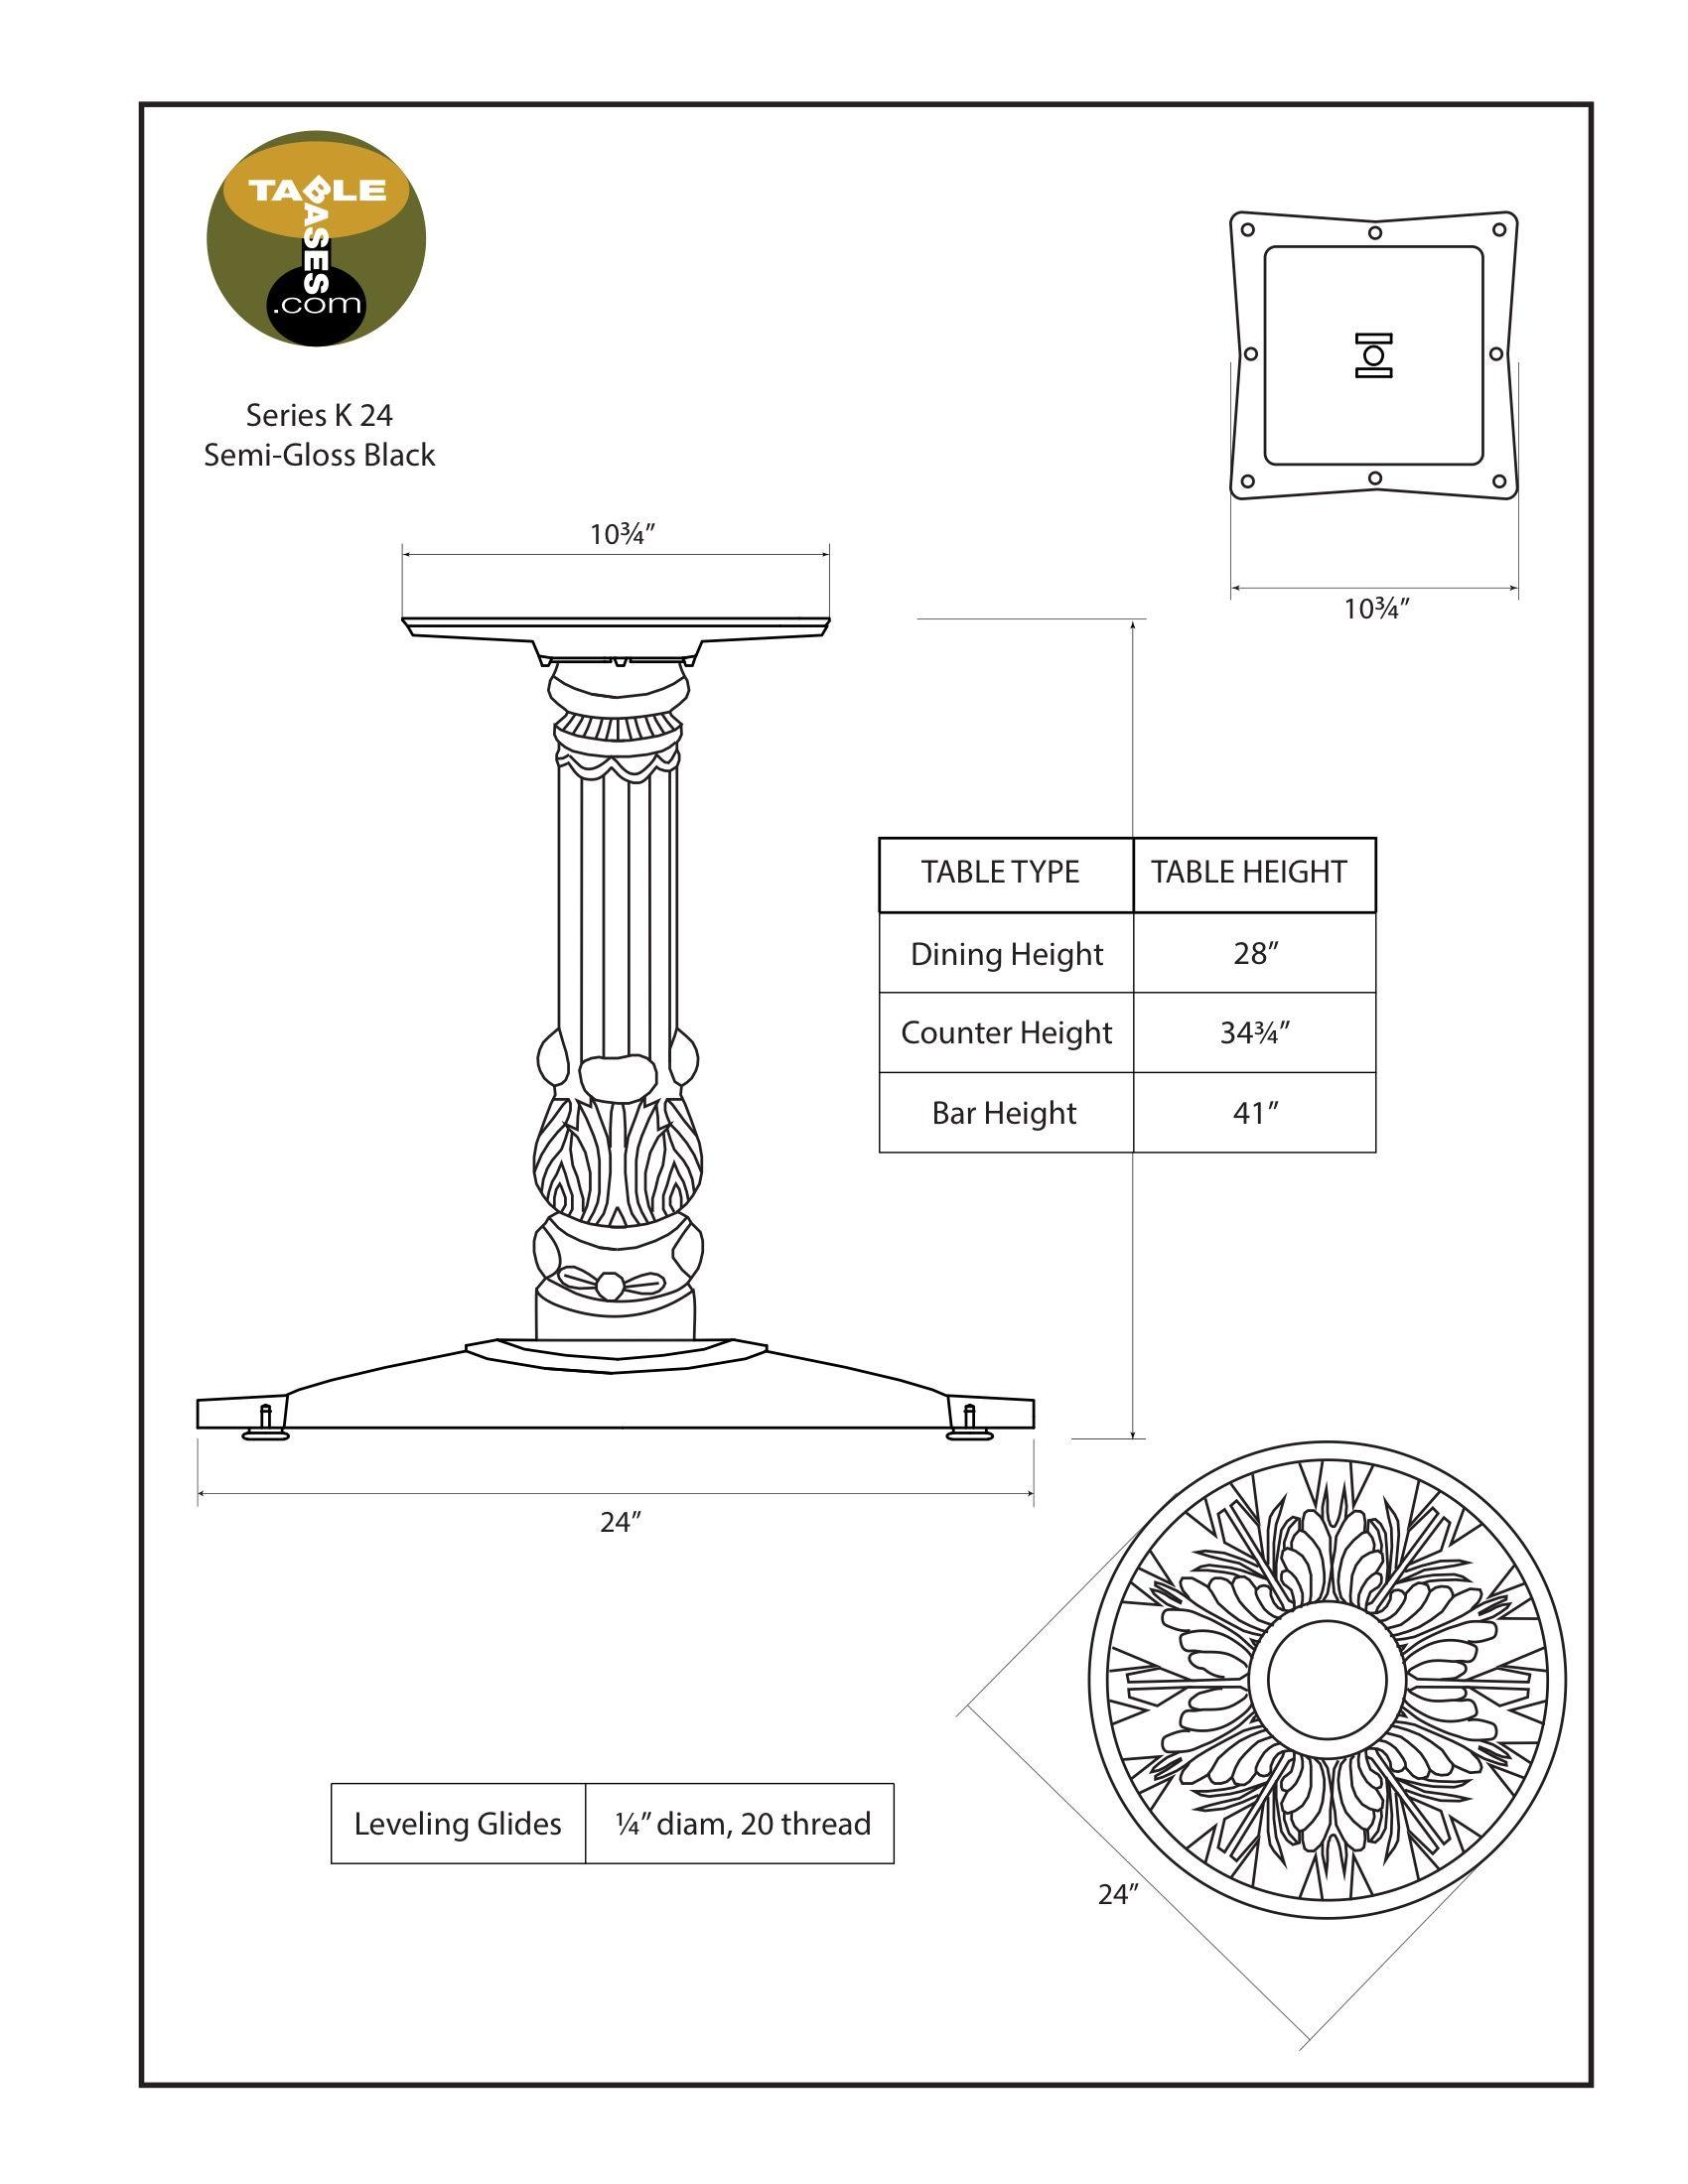 K24 Semi-Gloss Black Table Base - Specifications